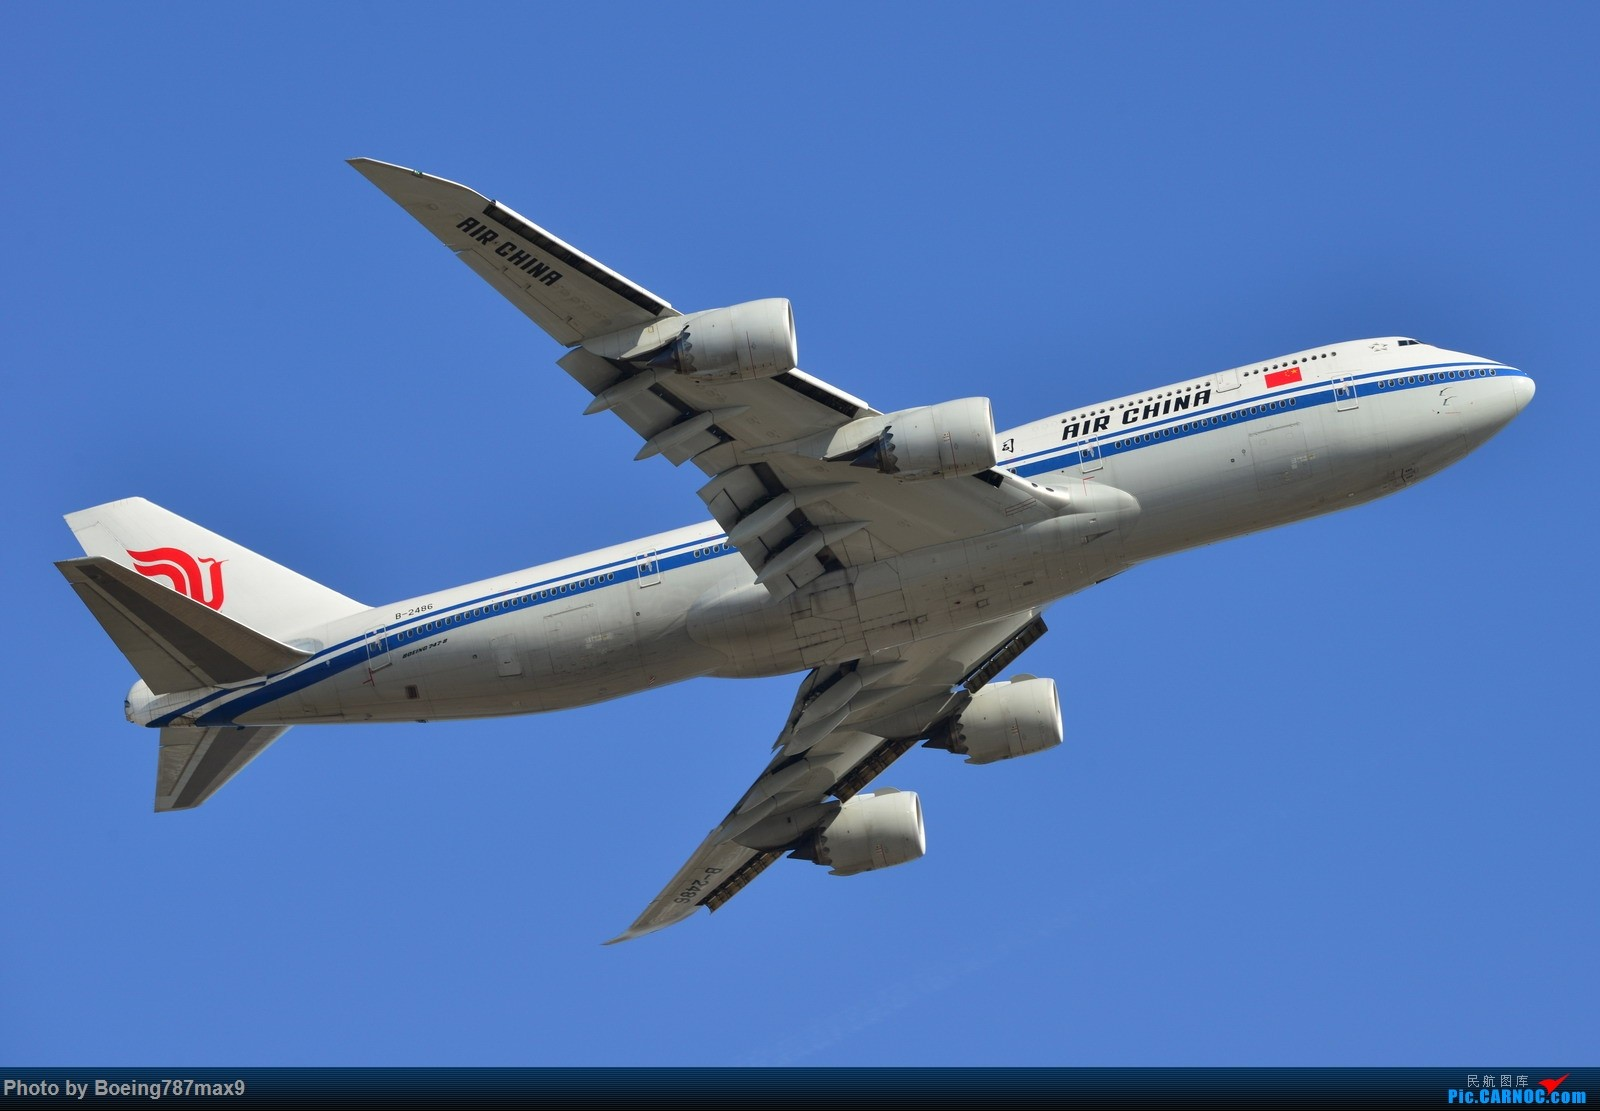 Re:[原创]【PEK】今日东停车场蹲点,好货一堆。KLM744、DELTA763、国航星空332、国航748、最重要的是朝鲜的图204、还有国航中法50年77W、汉莎346 BOEING 747-8I B-2486 中国北京首都国际机场